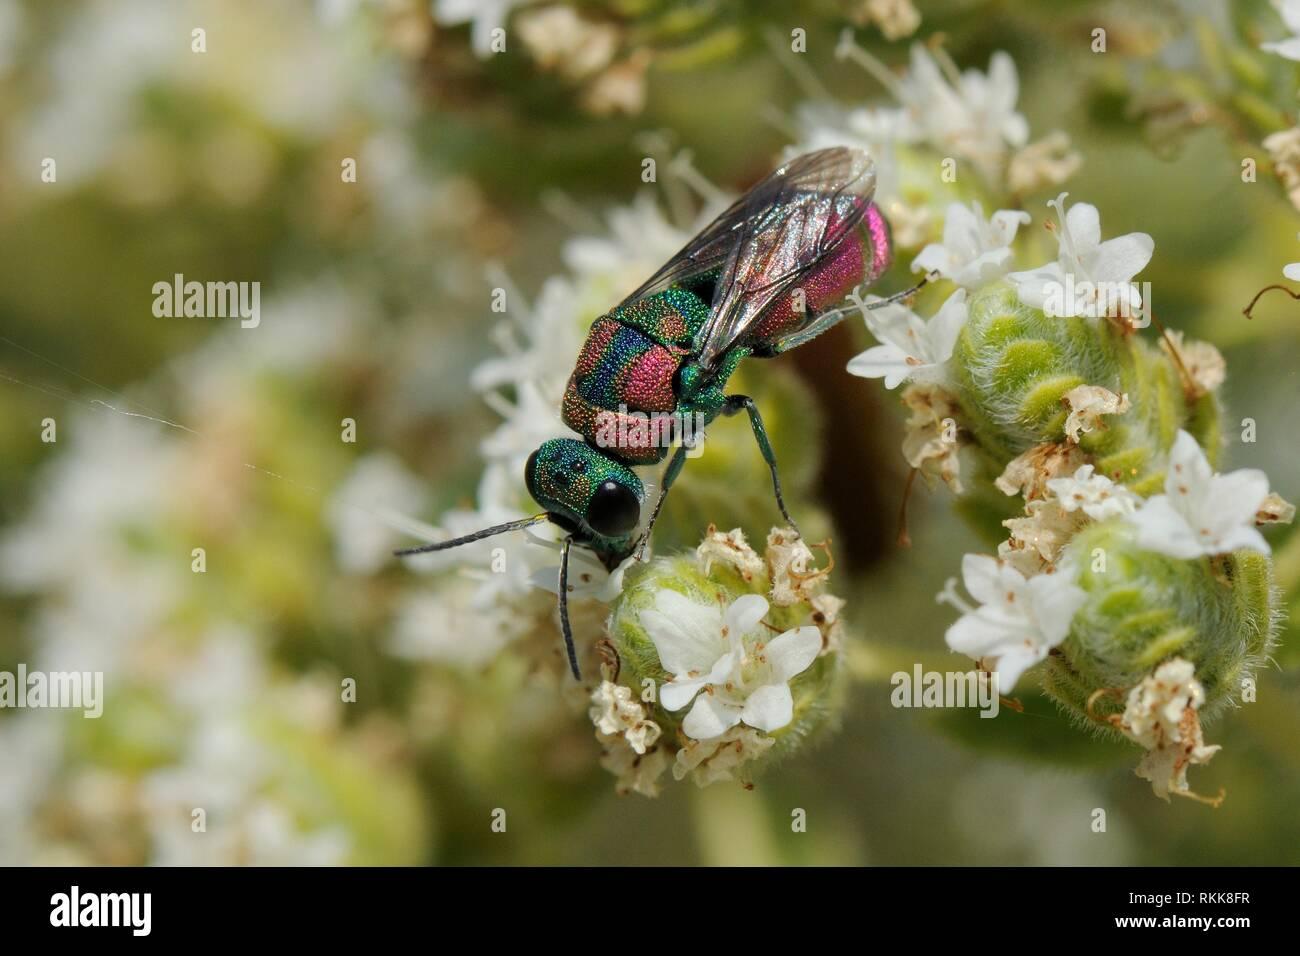 Ruby-tailed avispa avispa Cuco / / Joya wasp (Pseudospinolia marqueti) alimentándose de orégano (Origanum onites cretense) flores, Lesbos / Lesbos, Grecia Foto de stock